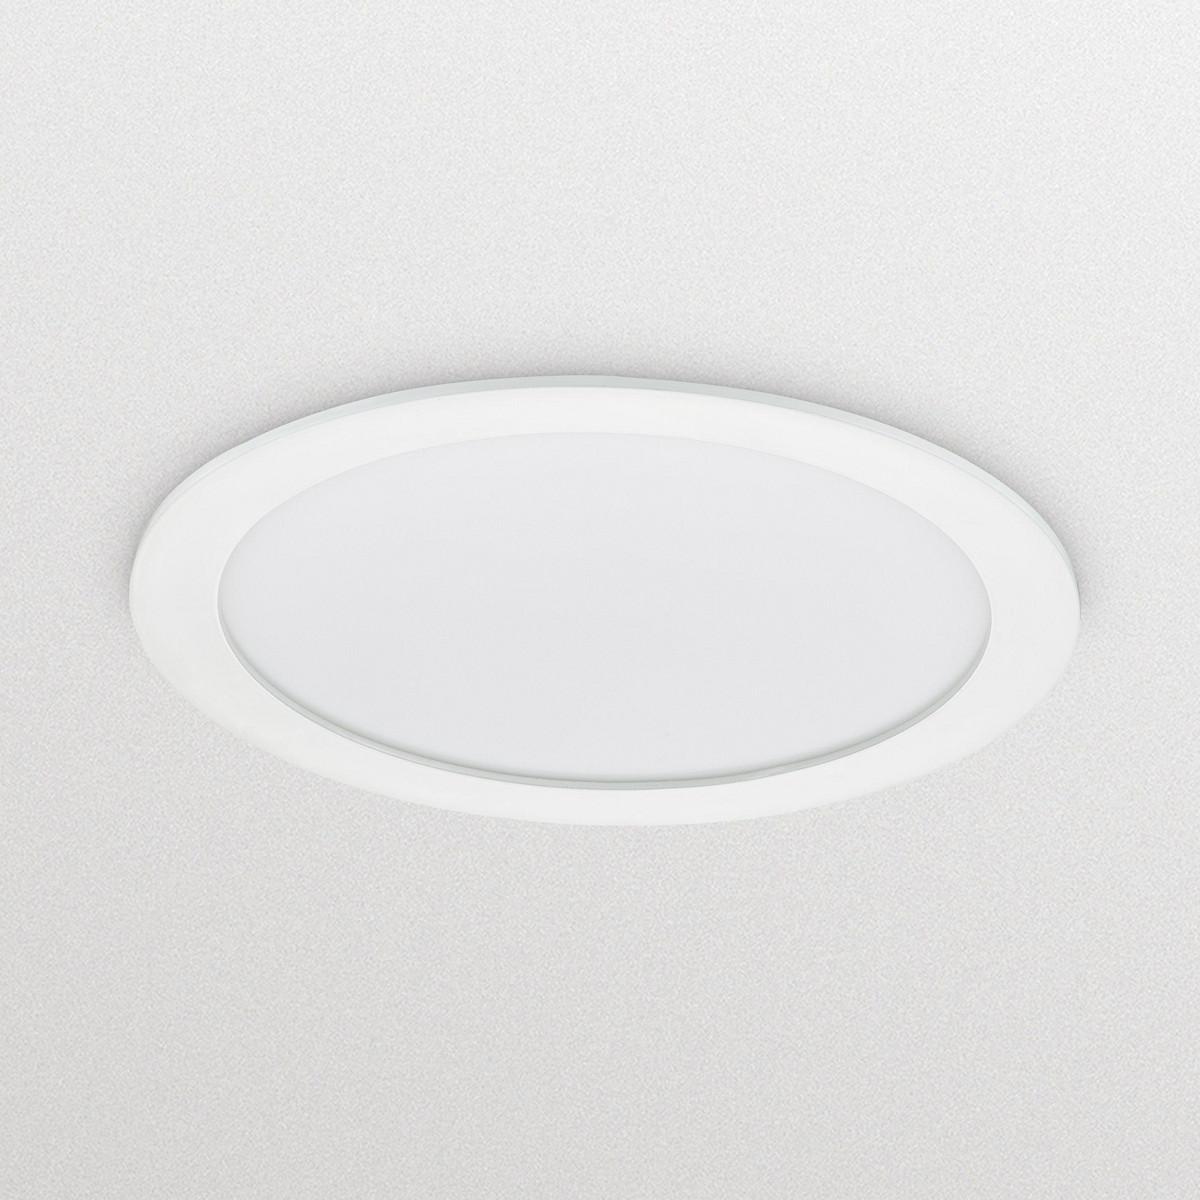 Philips CoreLine SlimDownlight DN145B LED 2100lm/840 DALI Hvid